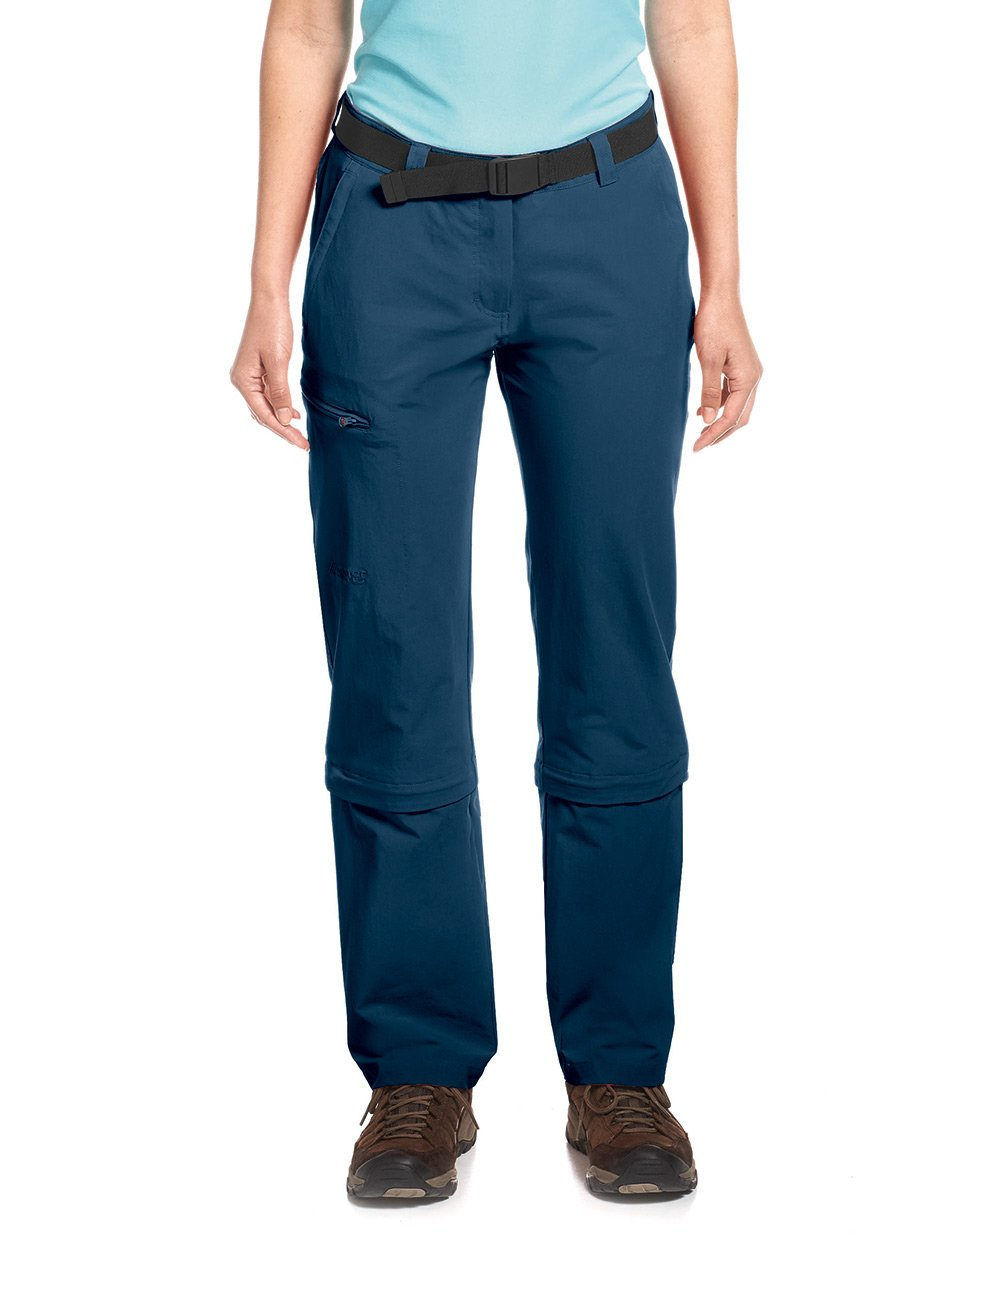 Bleu - Aviator Longueur   75 cm Maier Sports Arolla Pantalon pour Femme Zip-Off